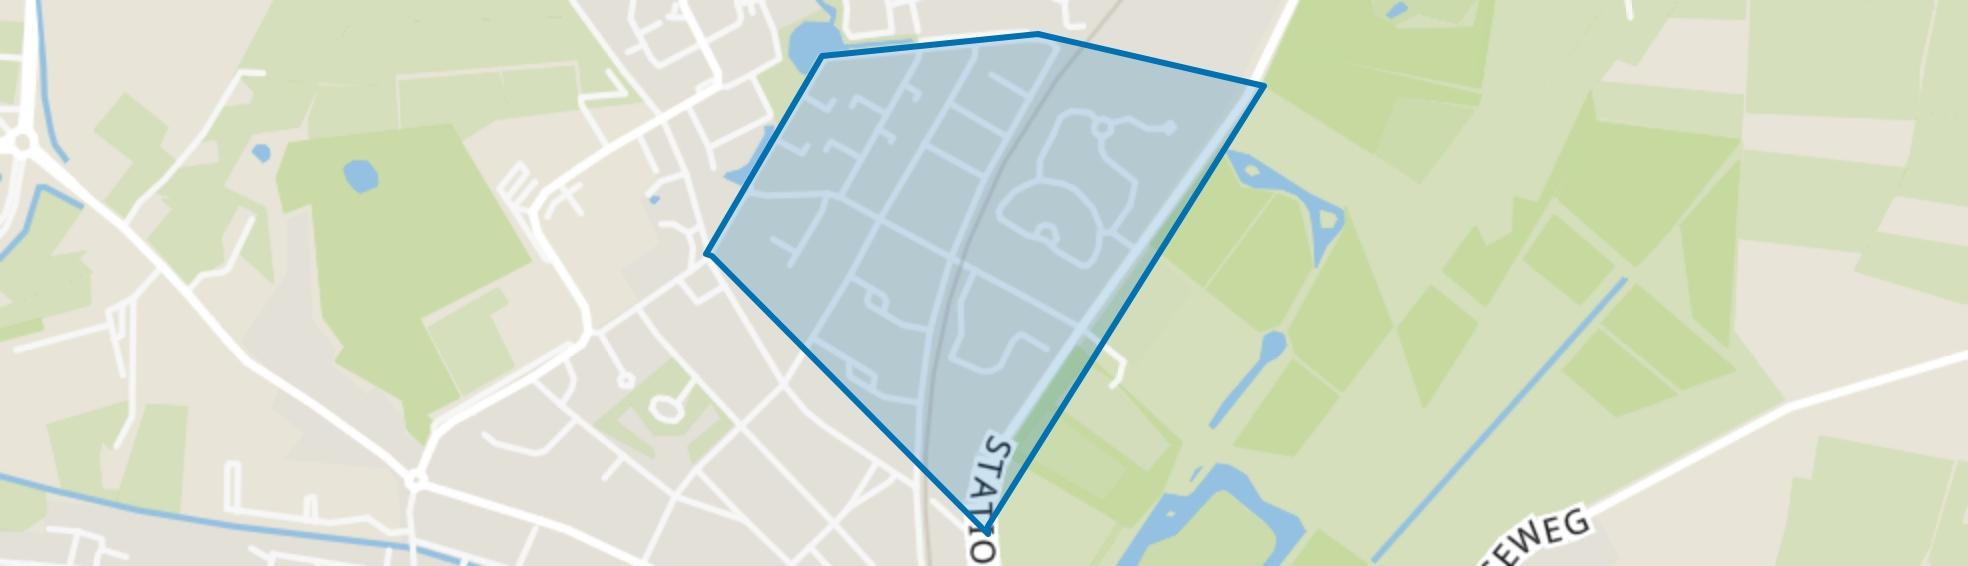 Vliegersveld, Barneveld map